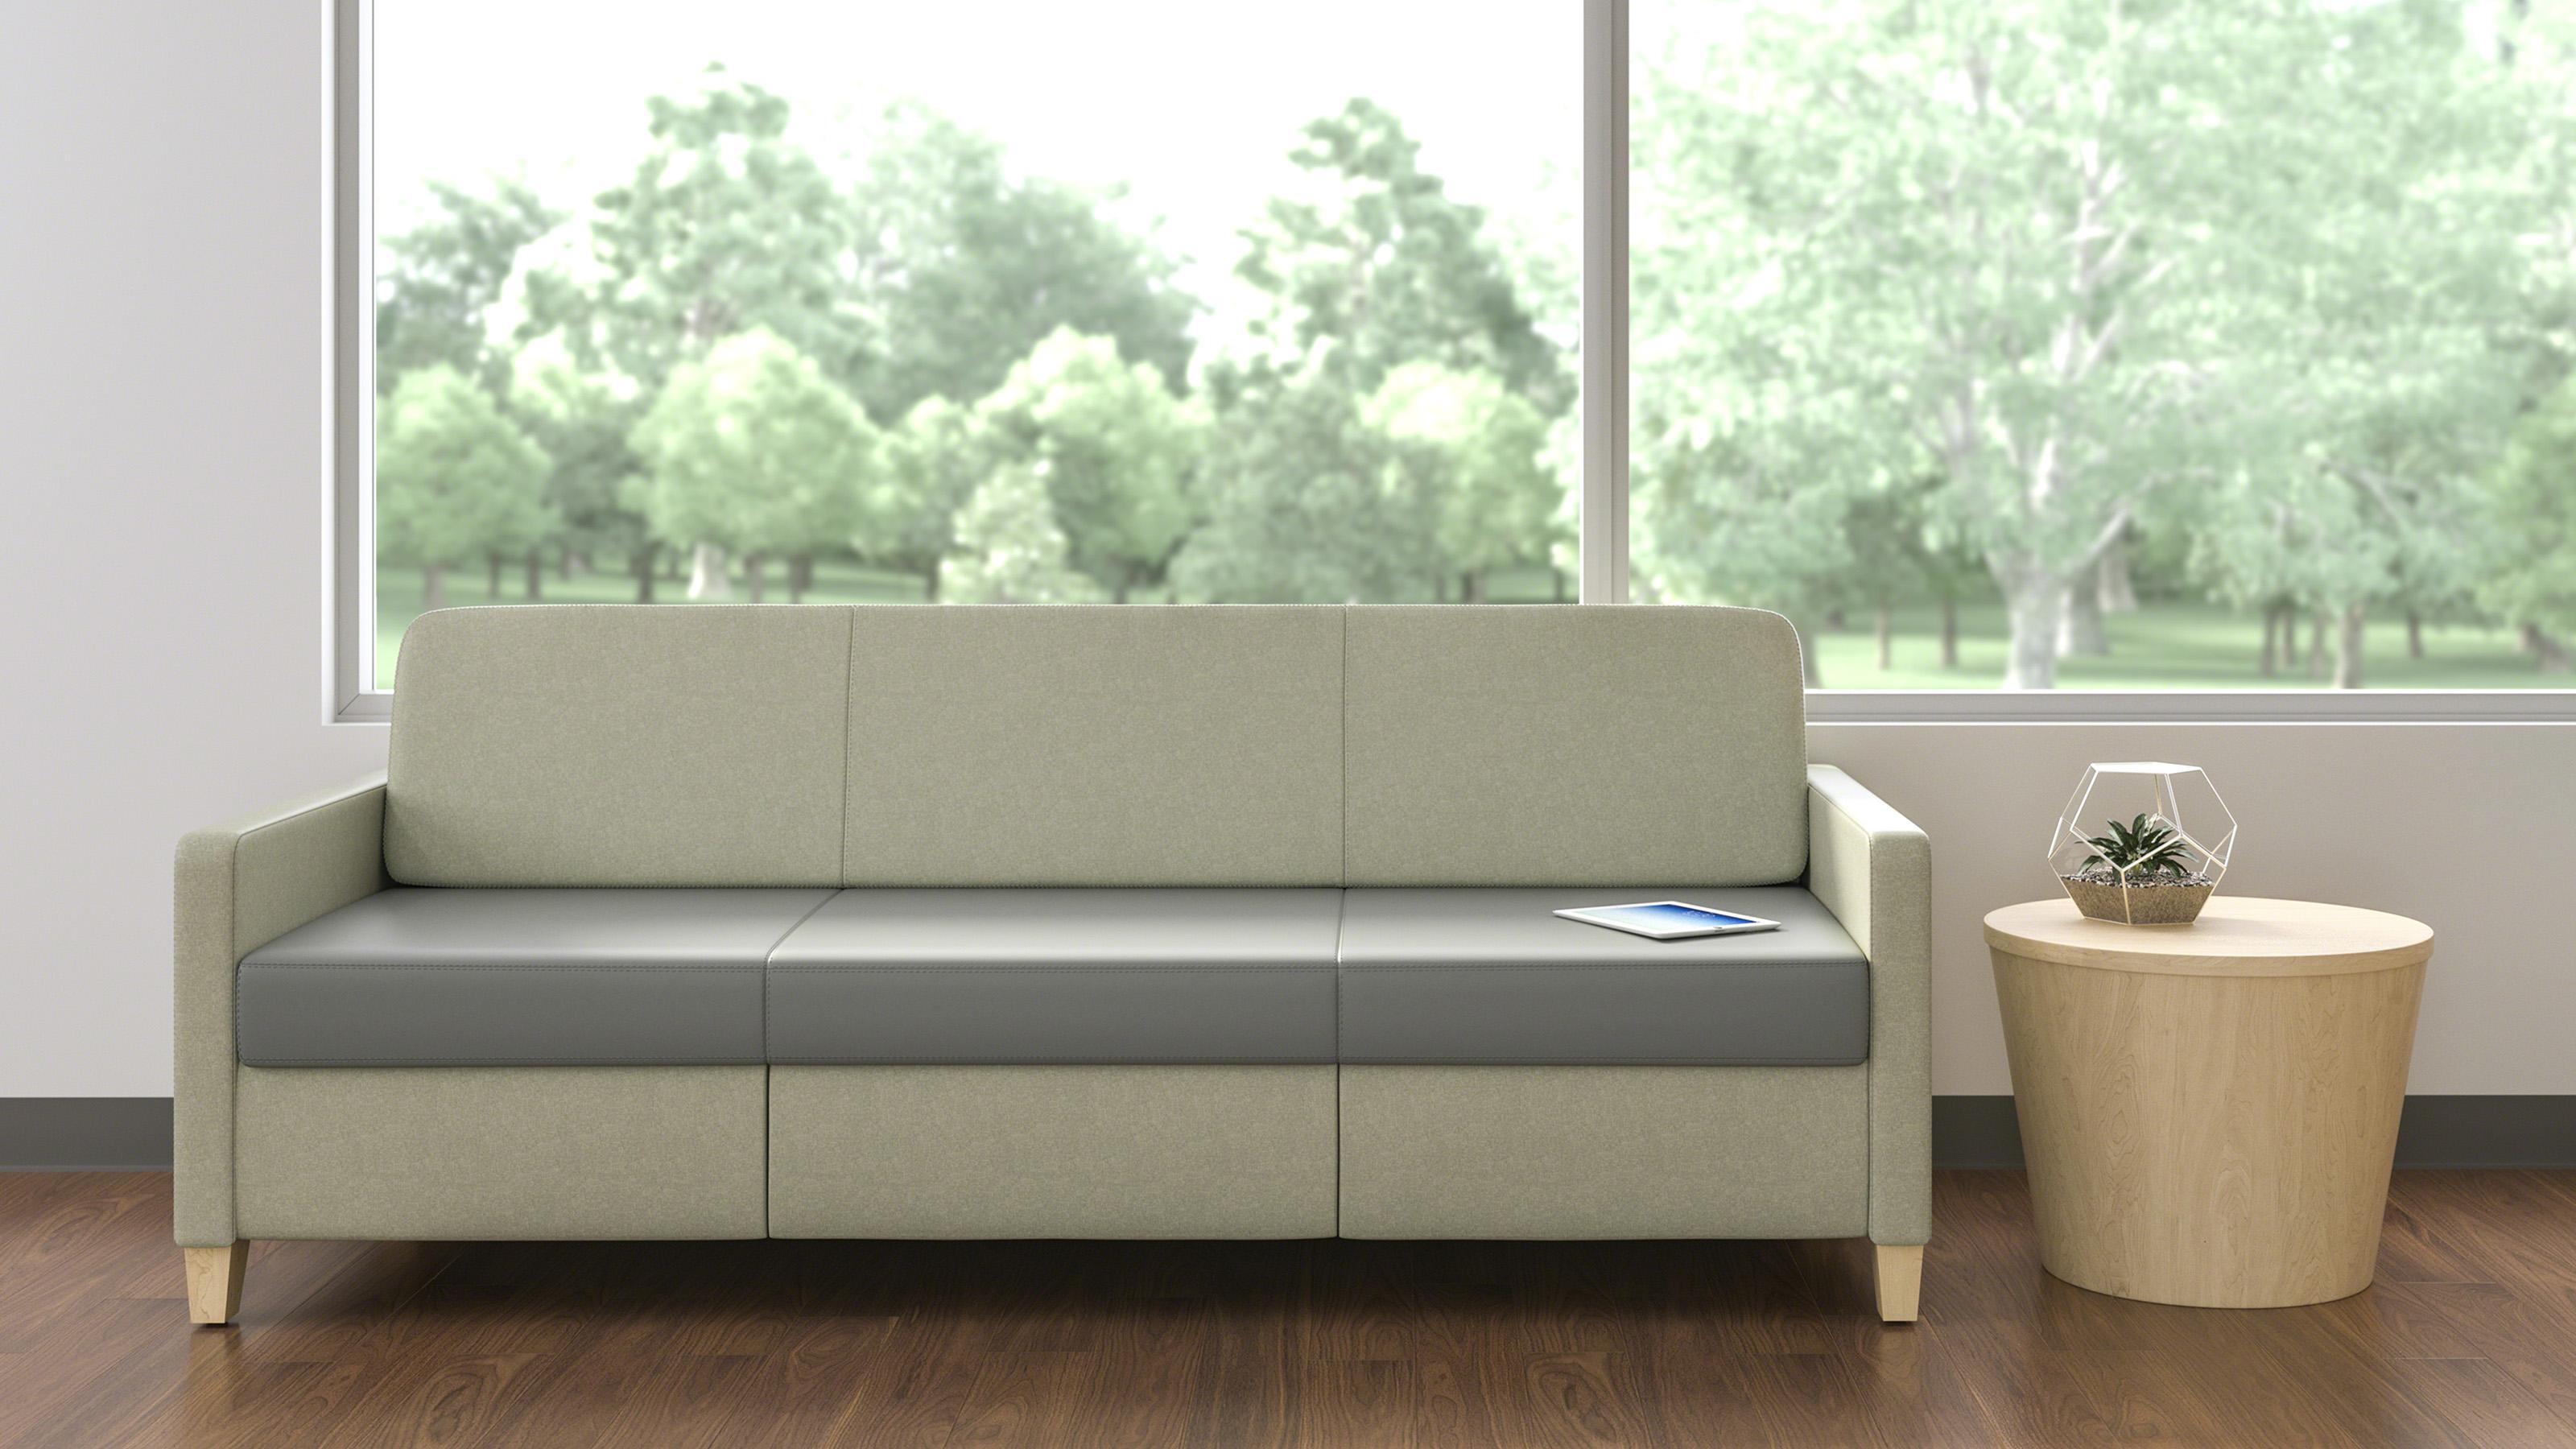 Terrific Sieste Lounge Seating And Sleeper Steelcase Uwap Interior Chair Design Uwaporg